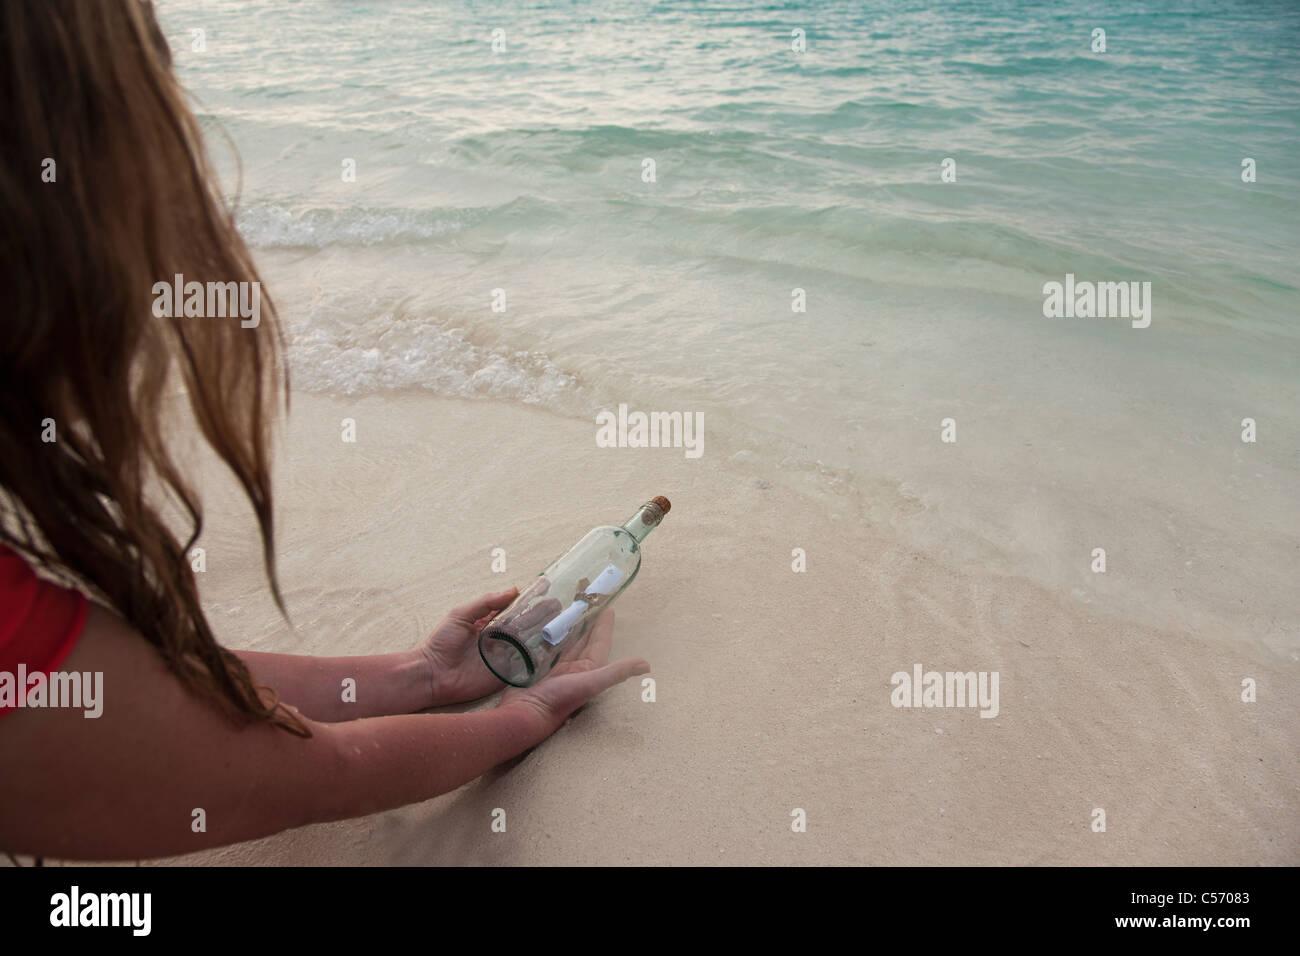 Femme avec message in a bottle at beach Photo Stock